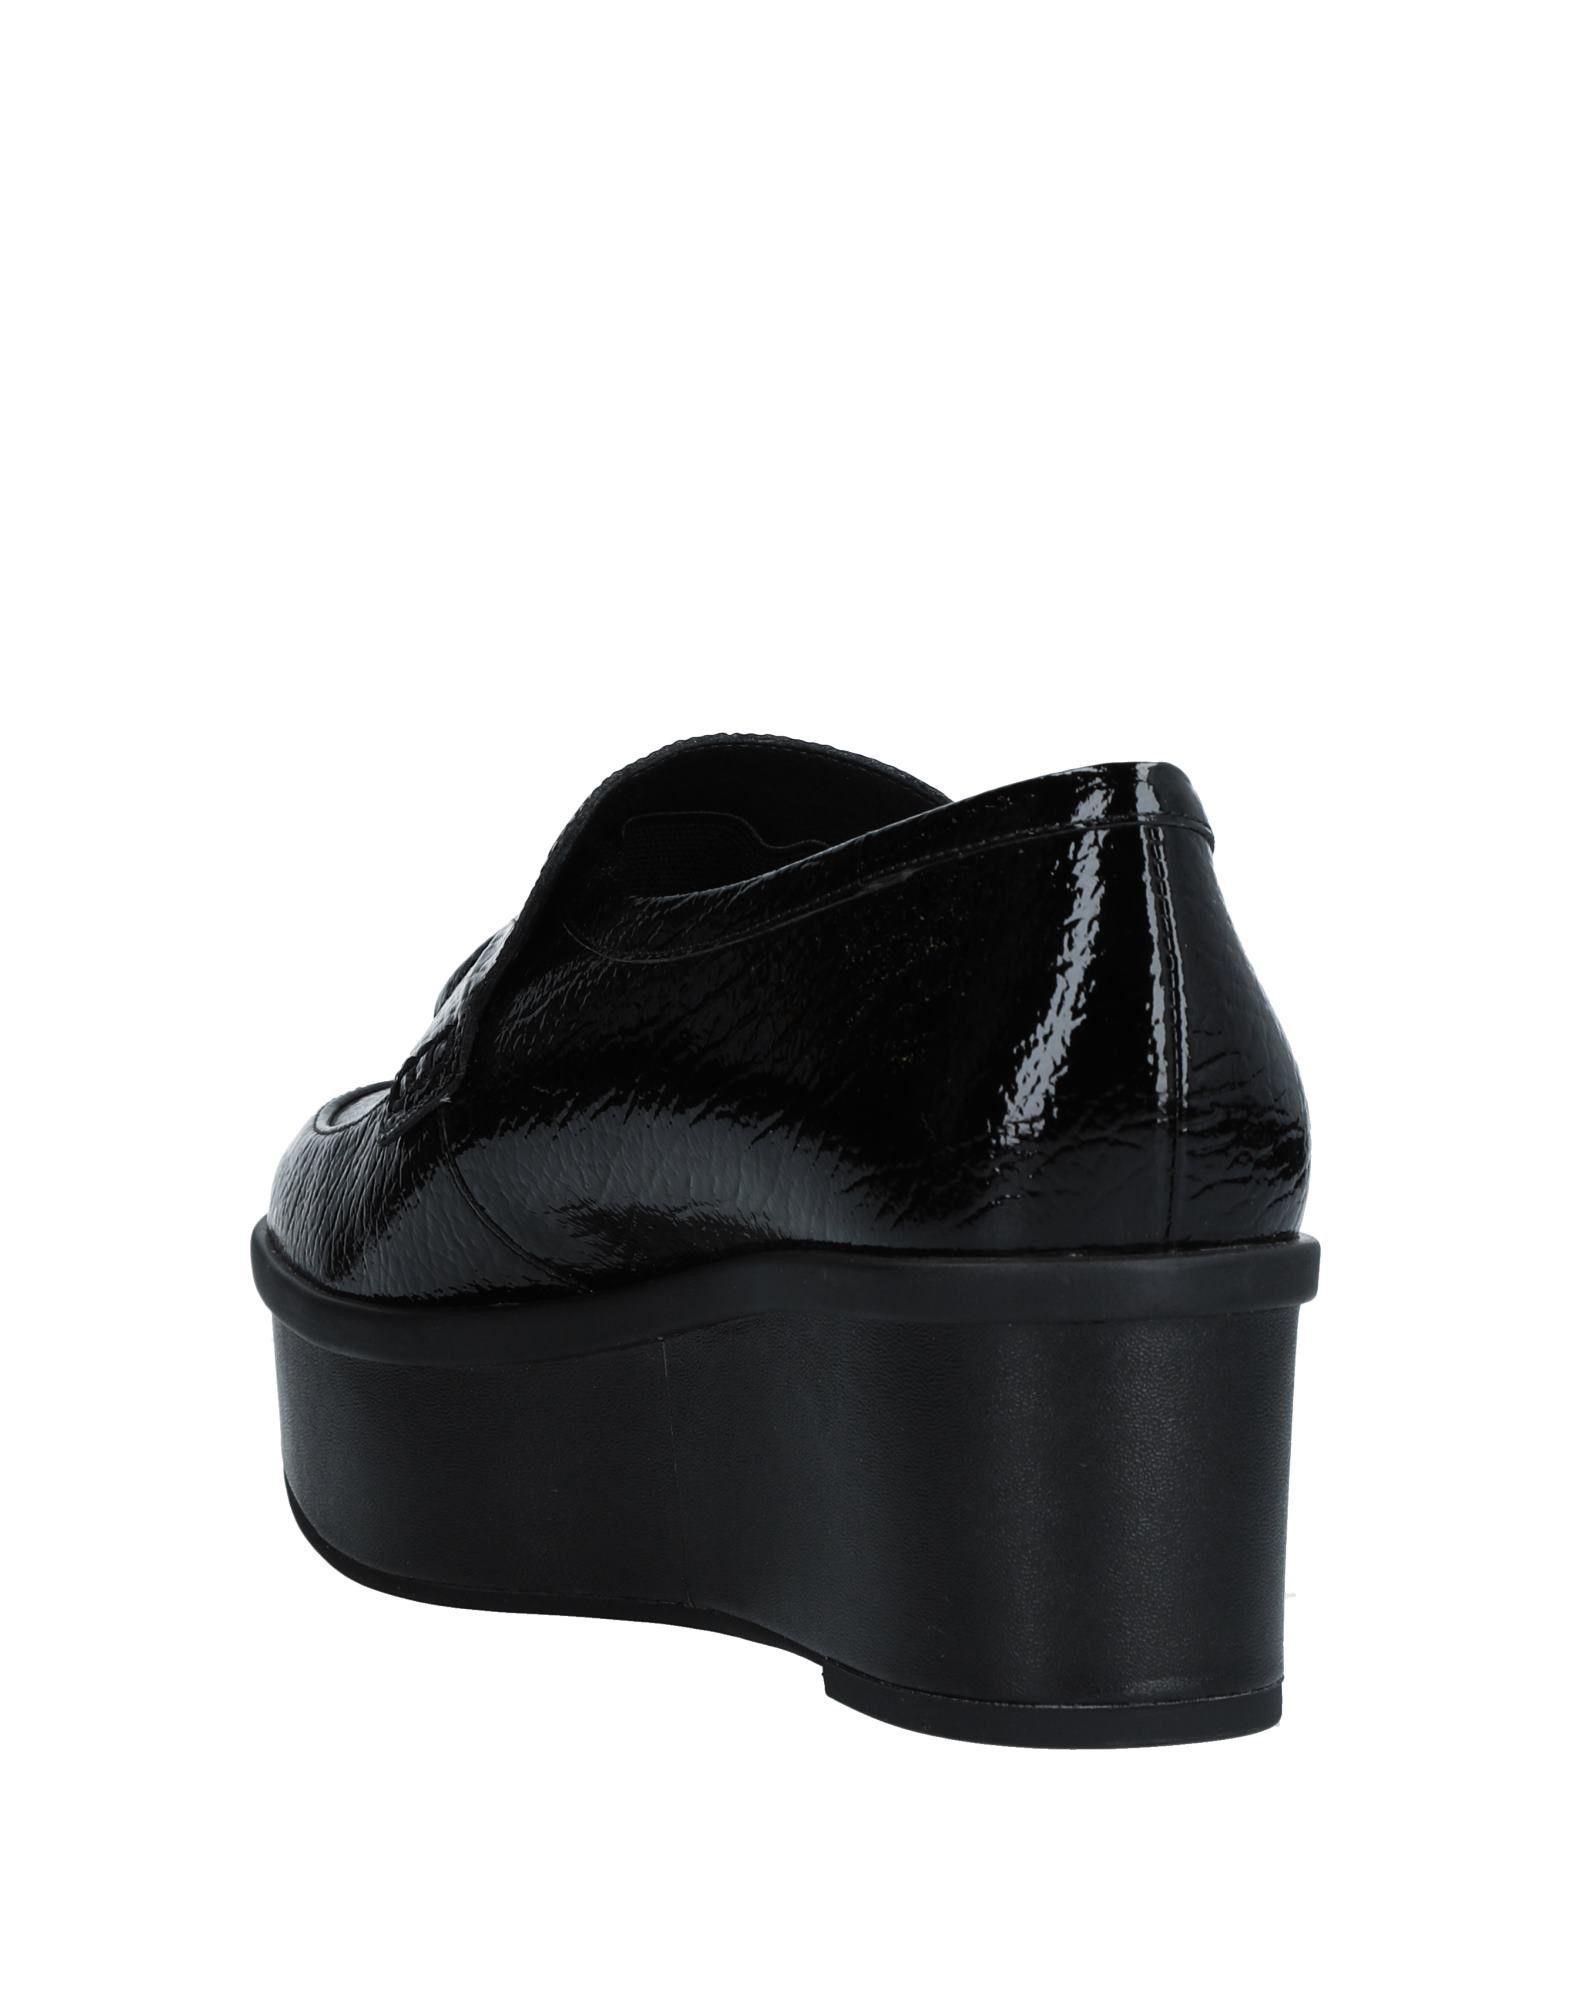 Mocasines What For de Cuero de color Negro